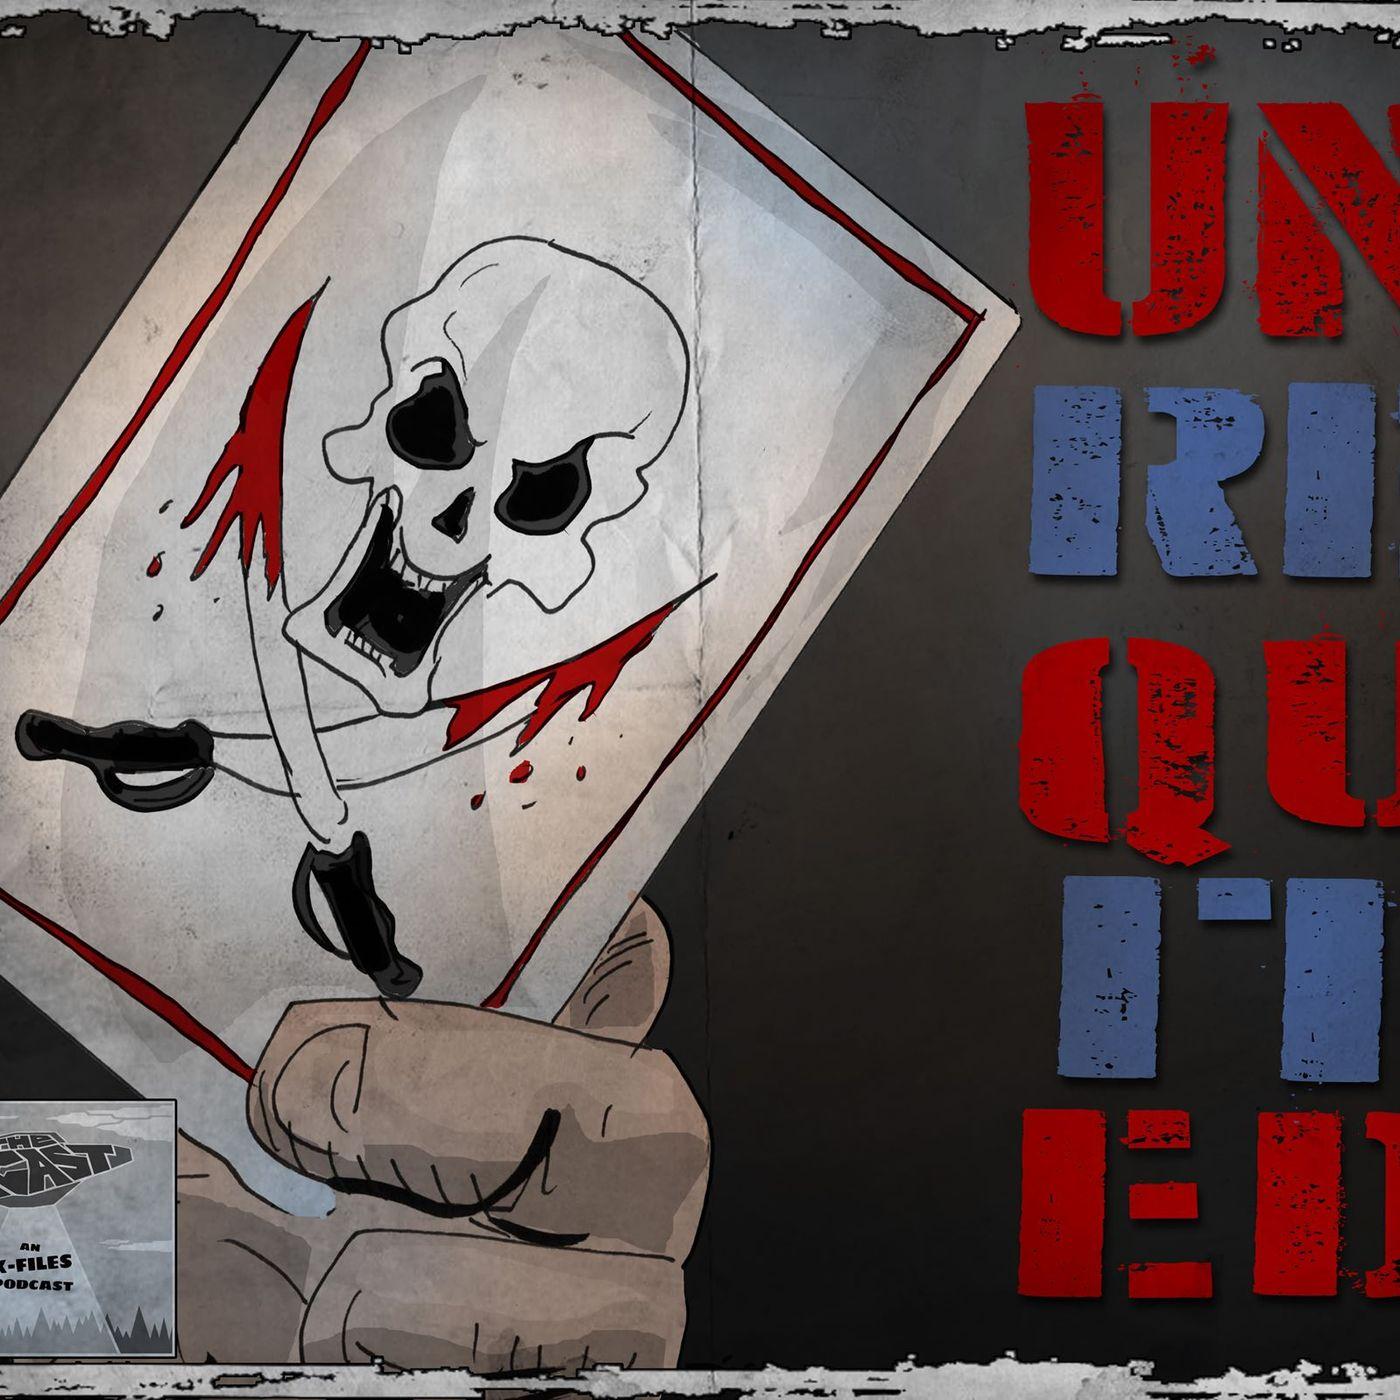 340. Unrequited